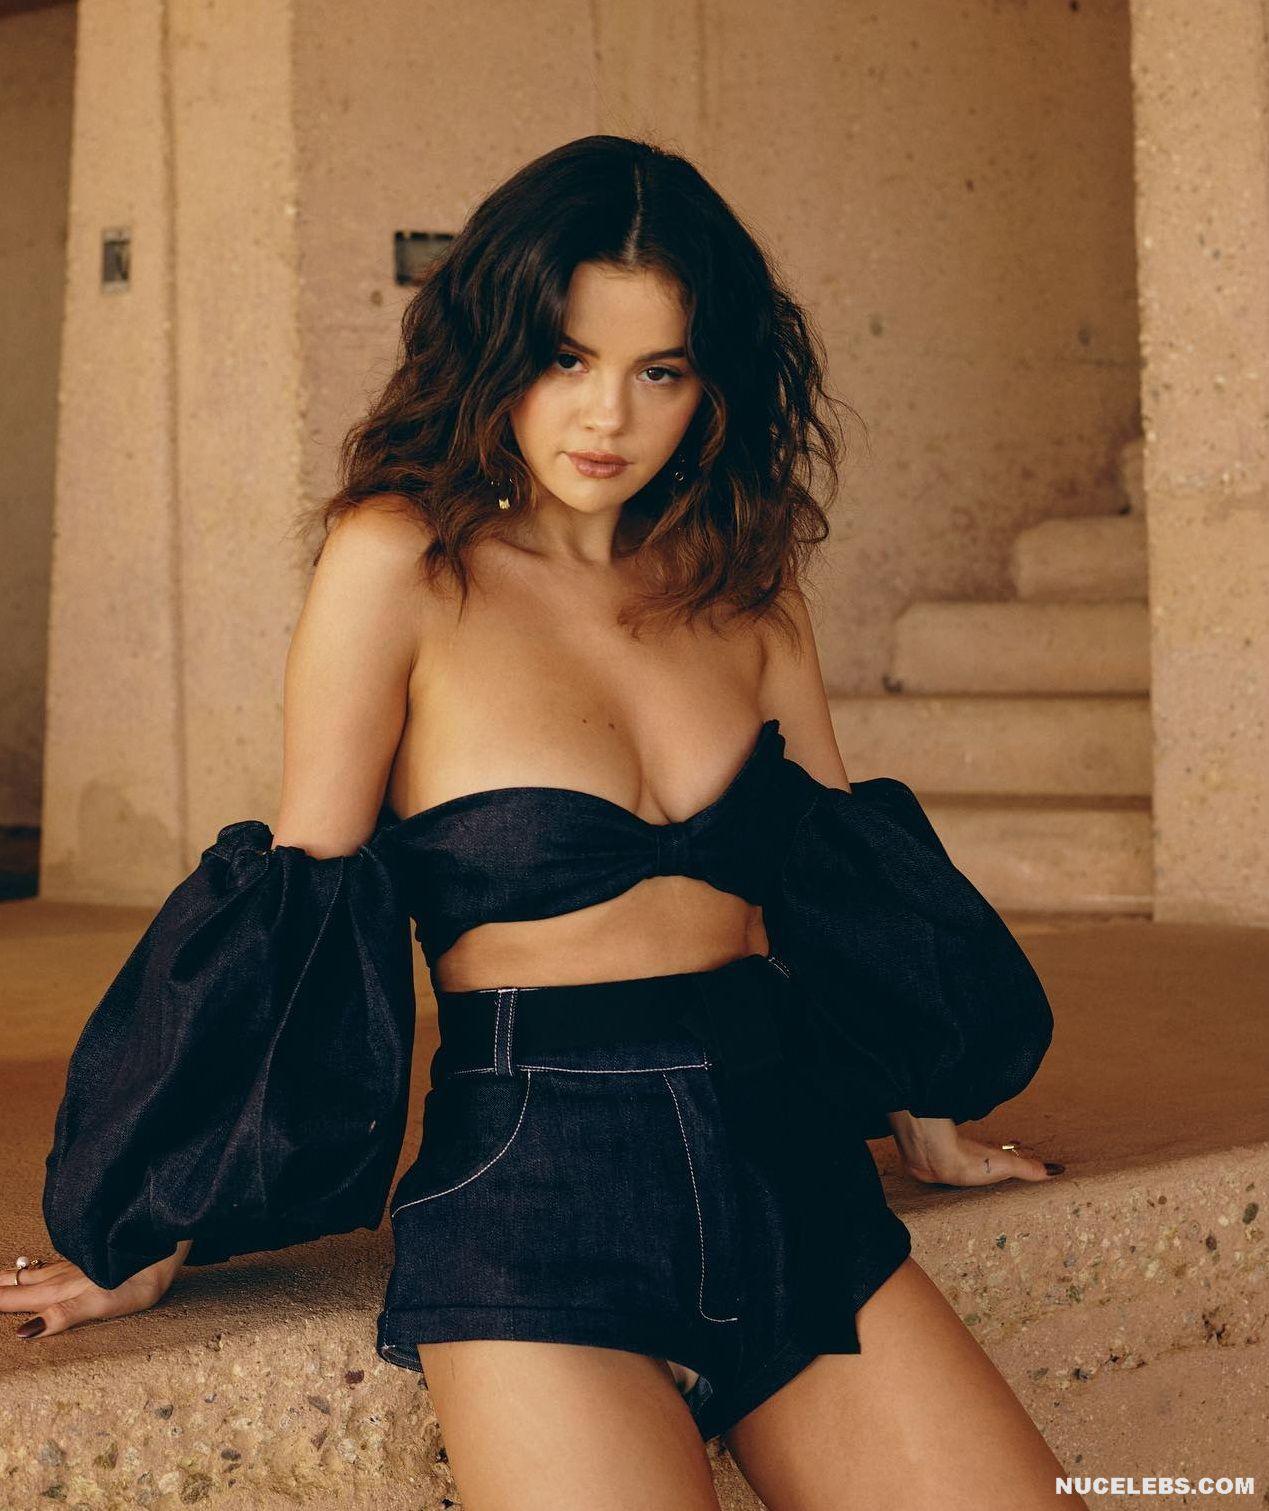 Nudes selena gomez Selena Gomez